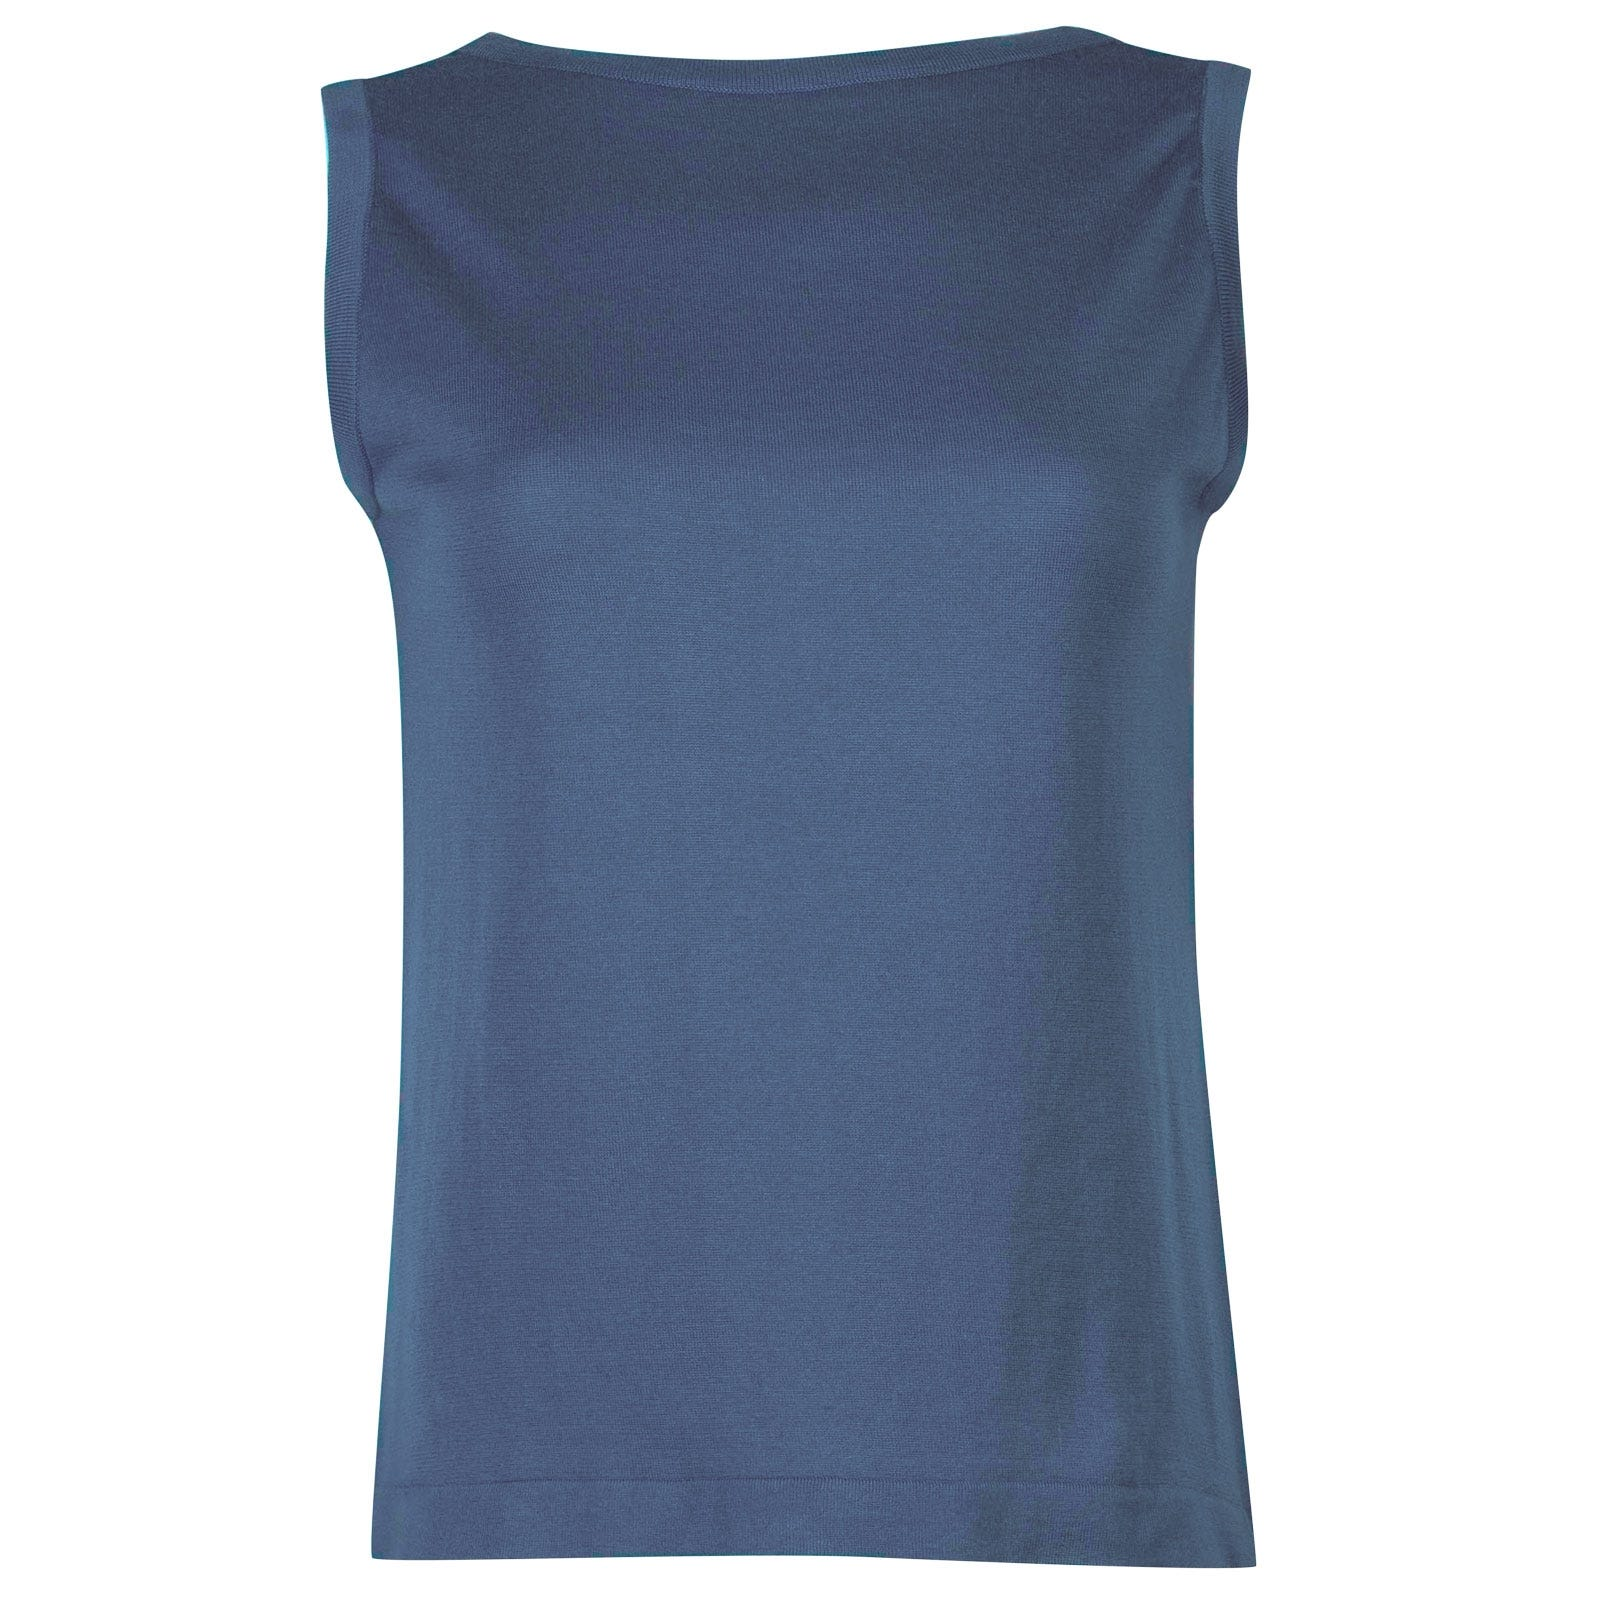 John Smedley Ana in Blue Iris Sweater-LGE